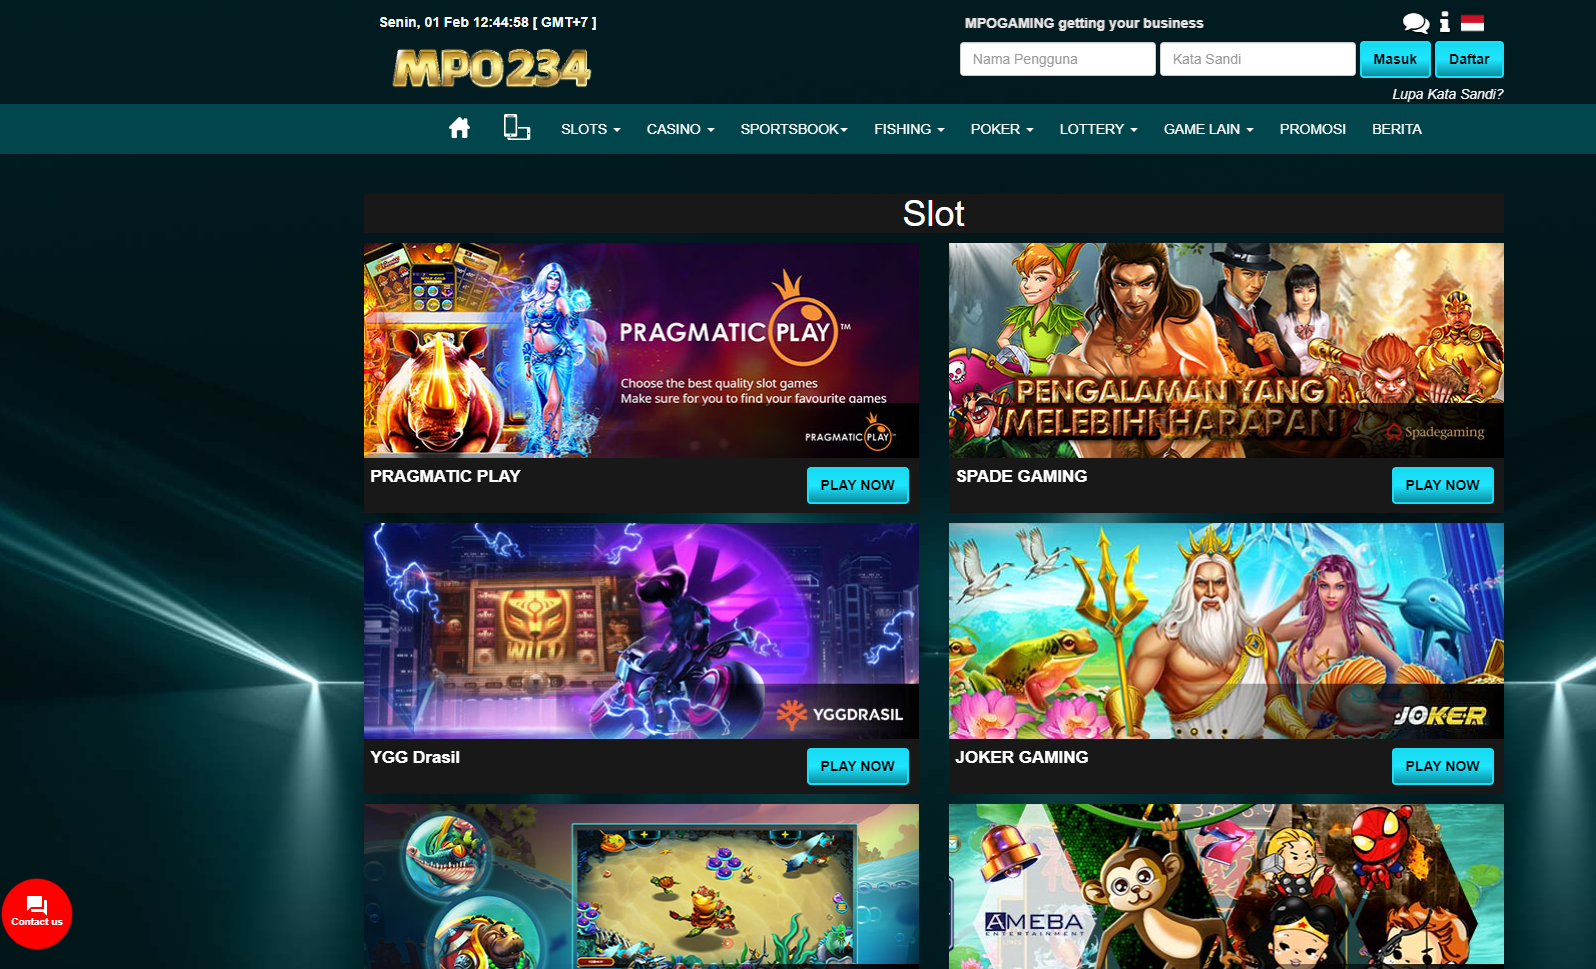 Mpo234 Situs Judi Slot Online Joker 123 Gaming Deposit Pulsa Indonesia Perfil Red Innpulso Foro